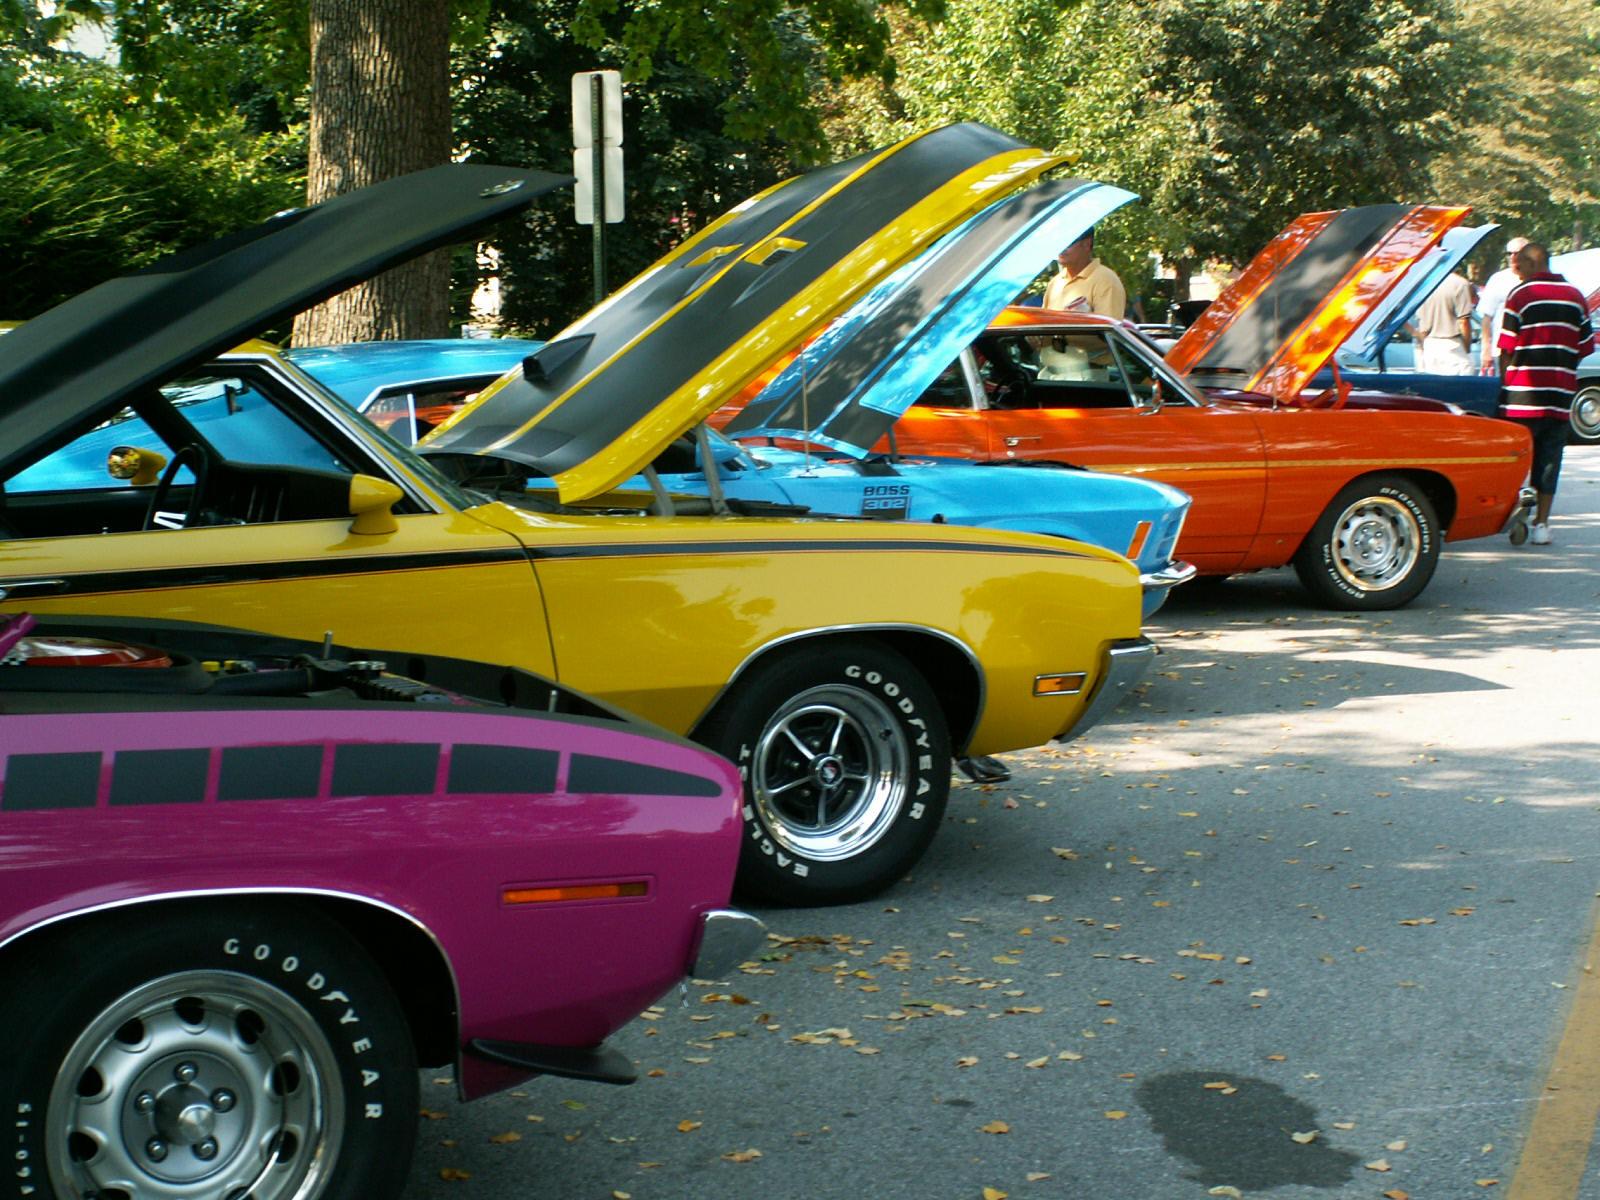 All Cars 4 U Antique Car Show Antique Cars Clasic Cars